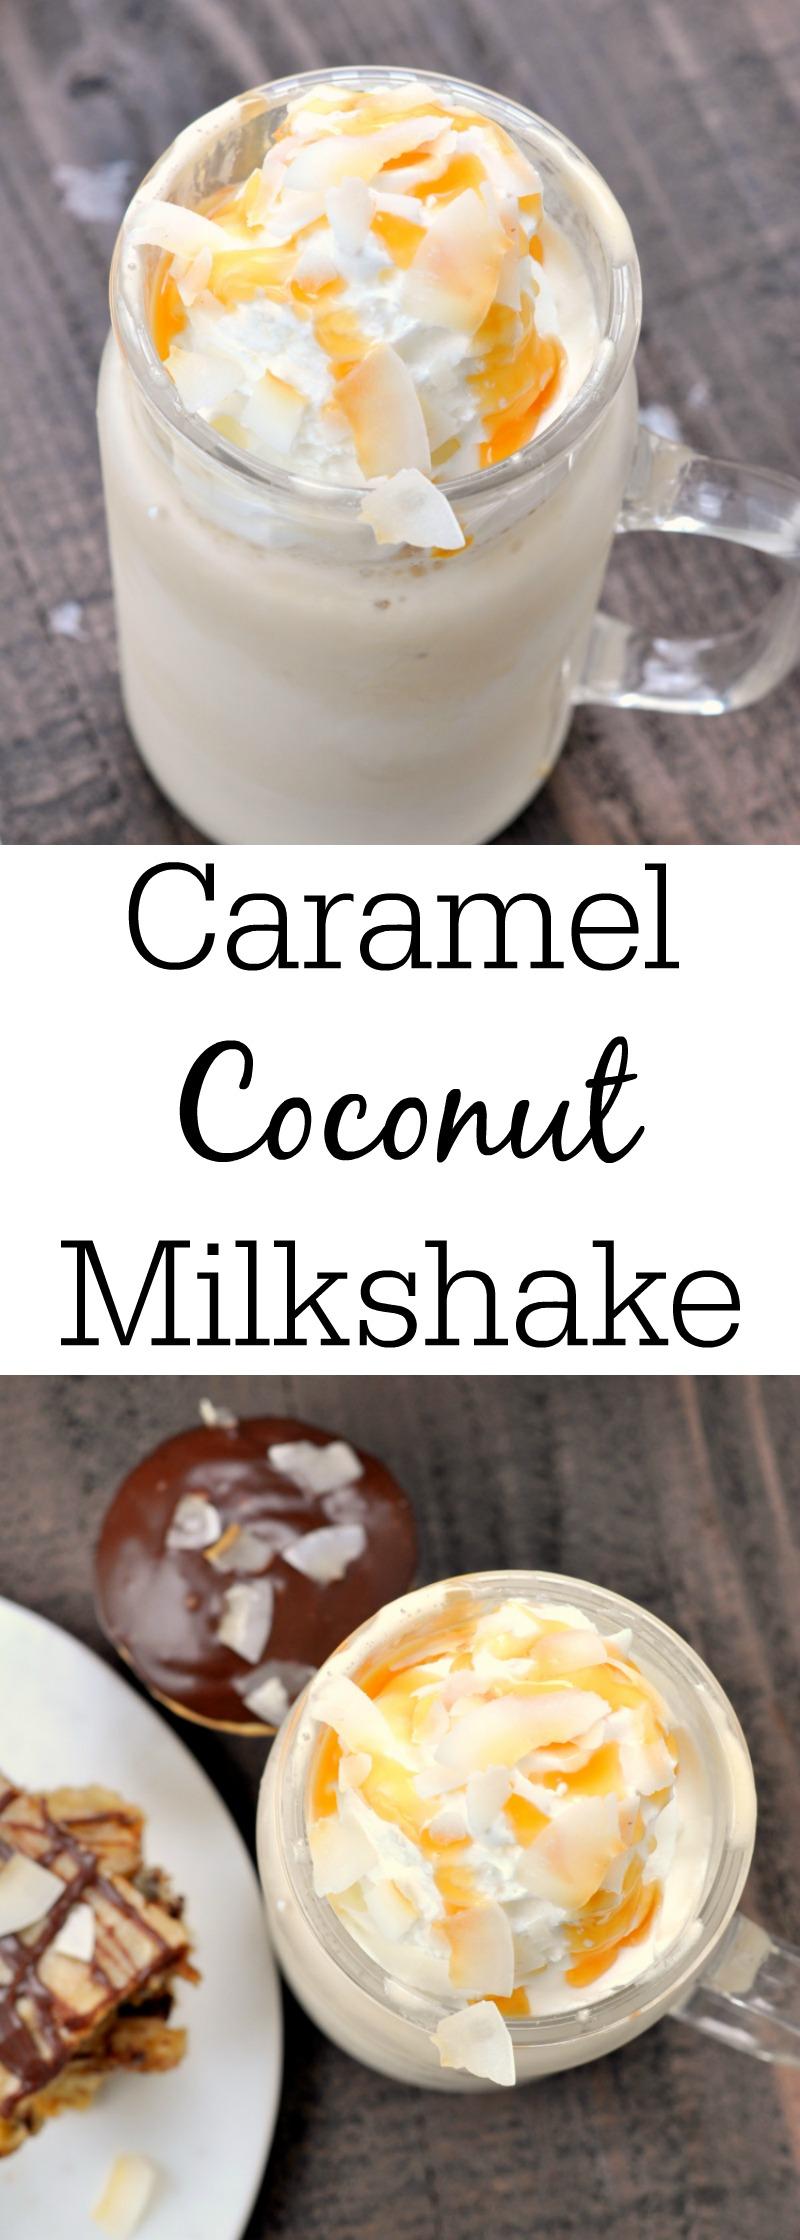 Salted Caramel Coconut Milkshake